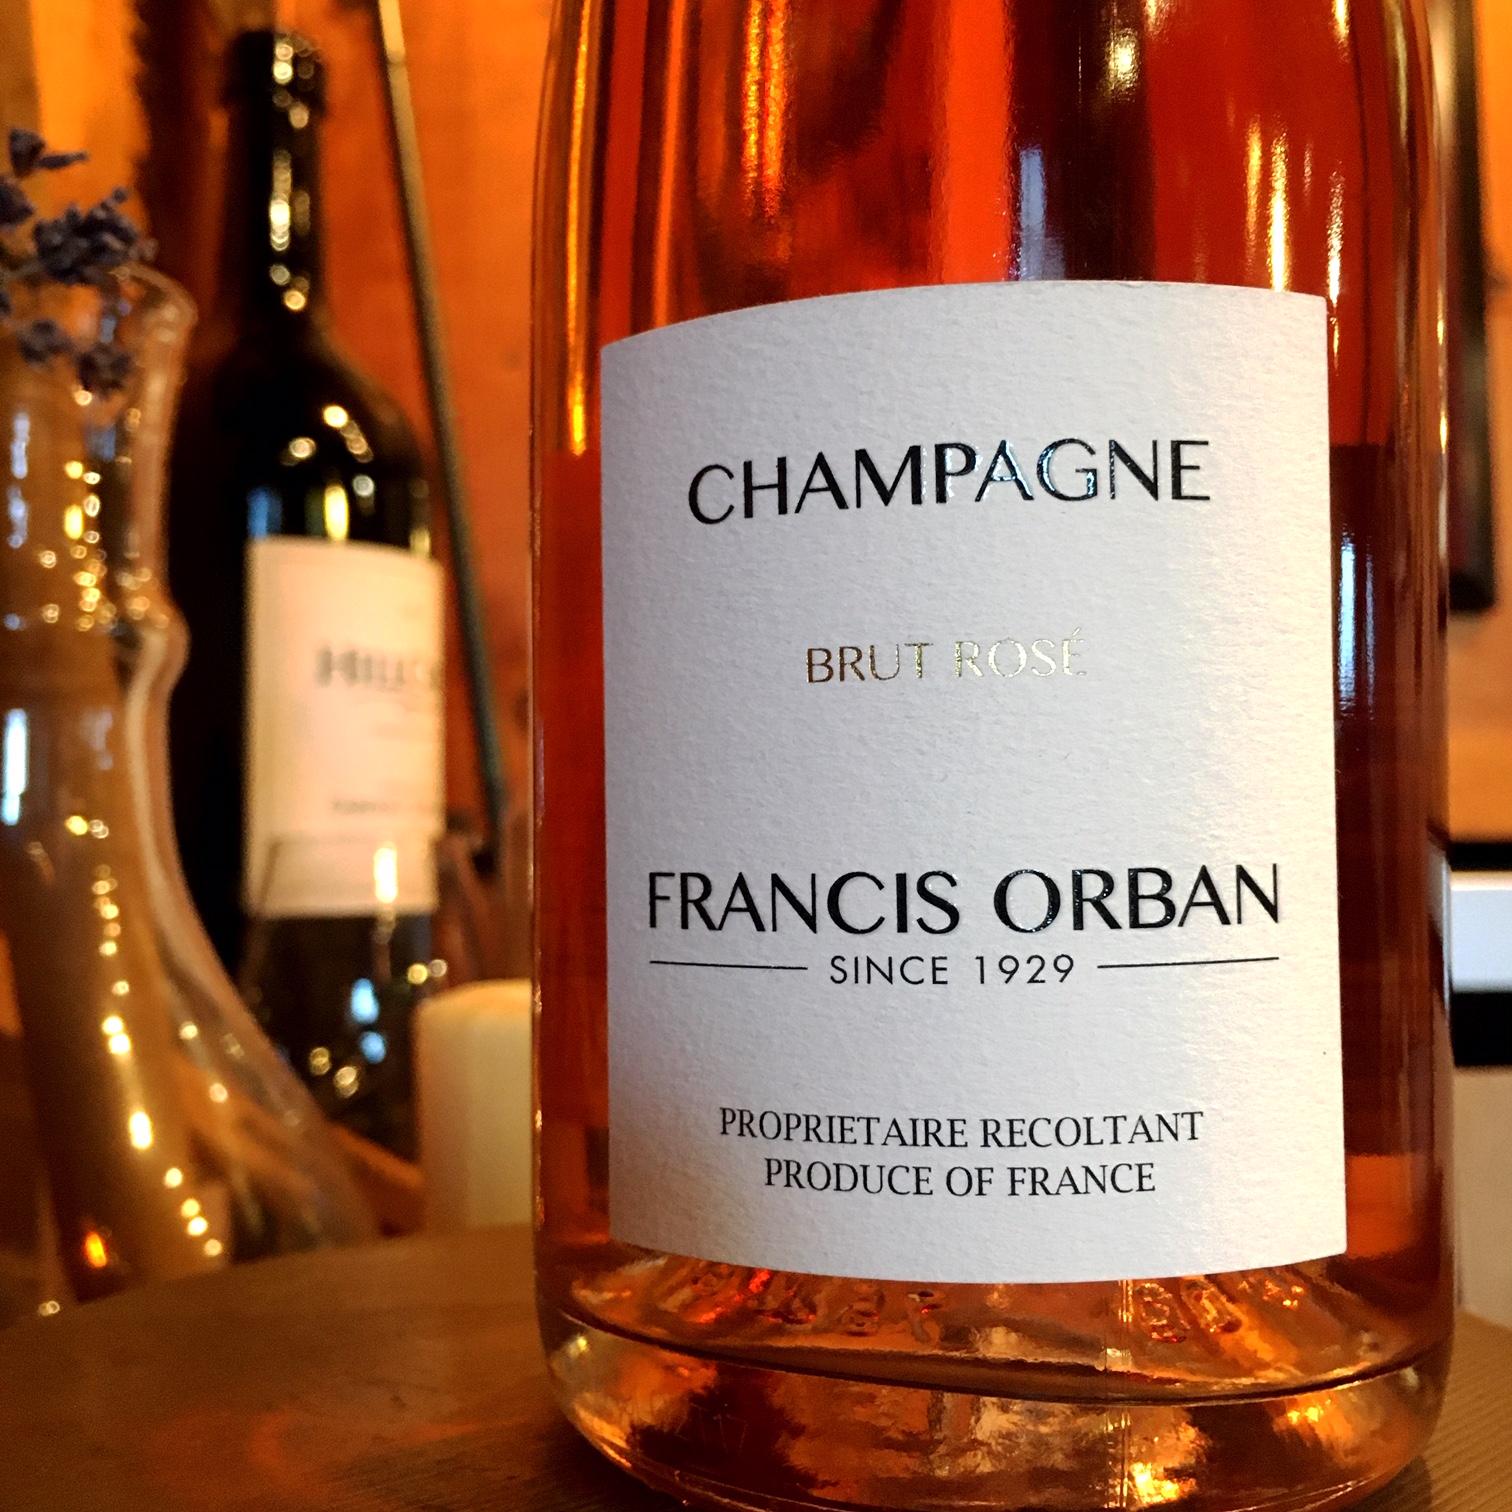 NV Domaine Francis Orban Brut Rosé Champagne